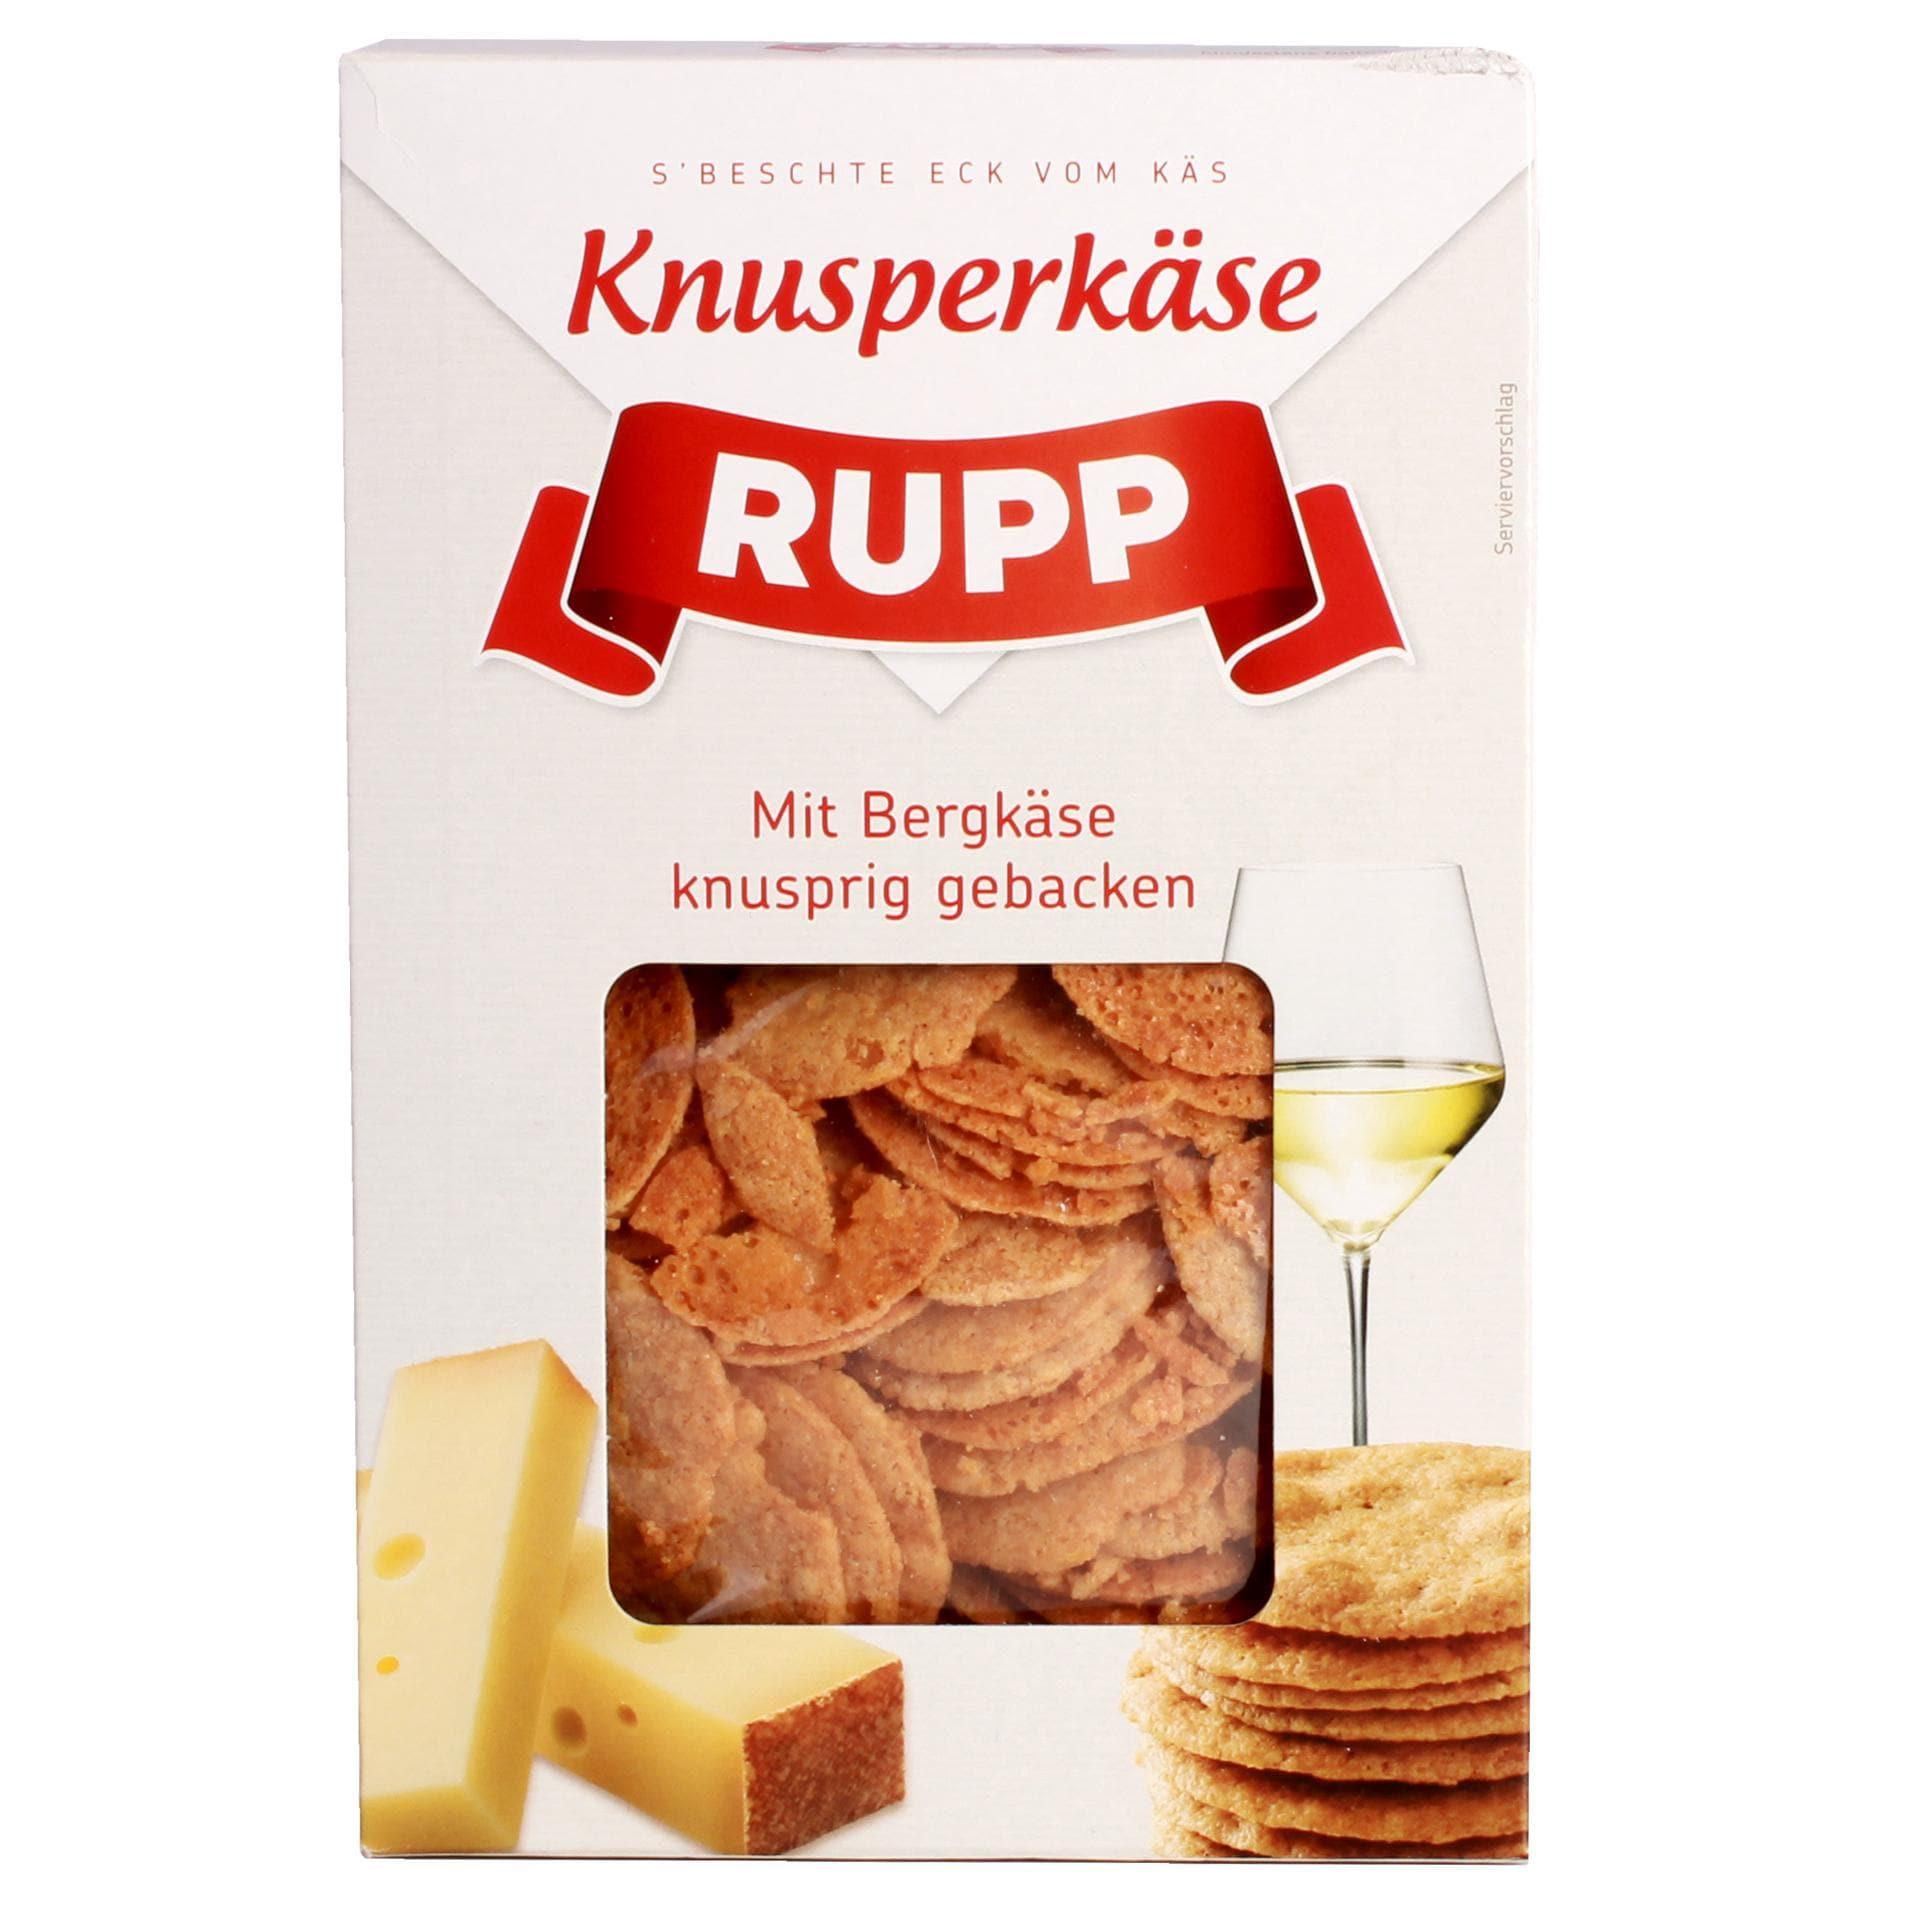 Rupp - Knusper Käse Cracker Österreichischer Bergkäse - 90g